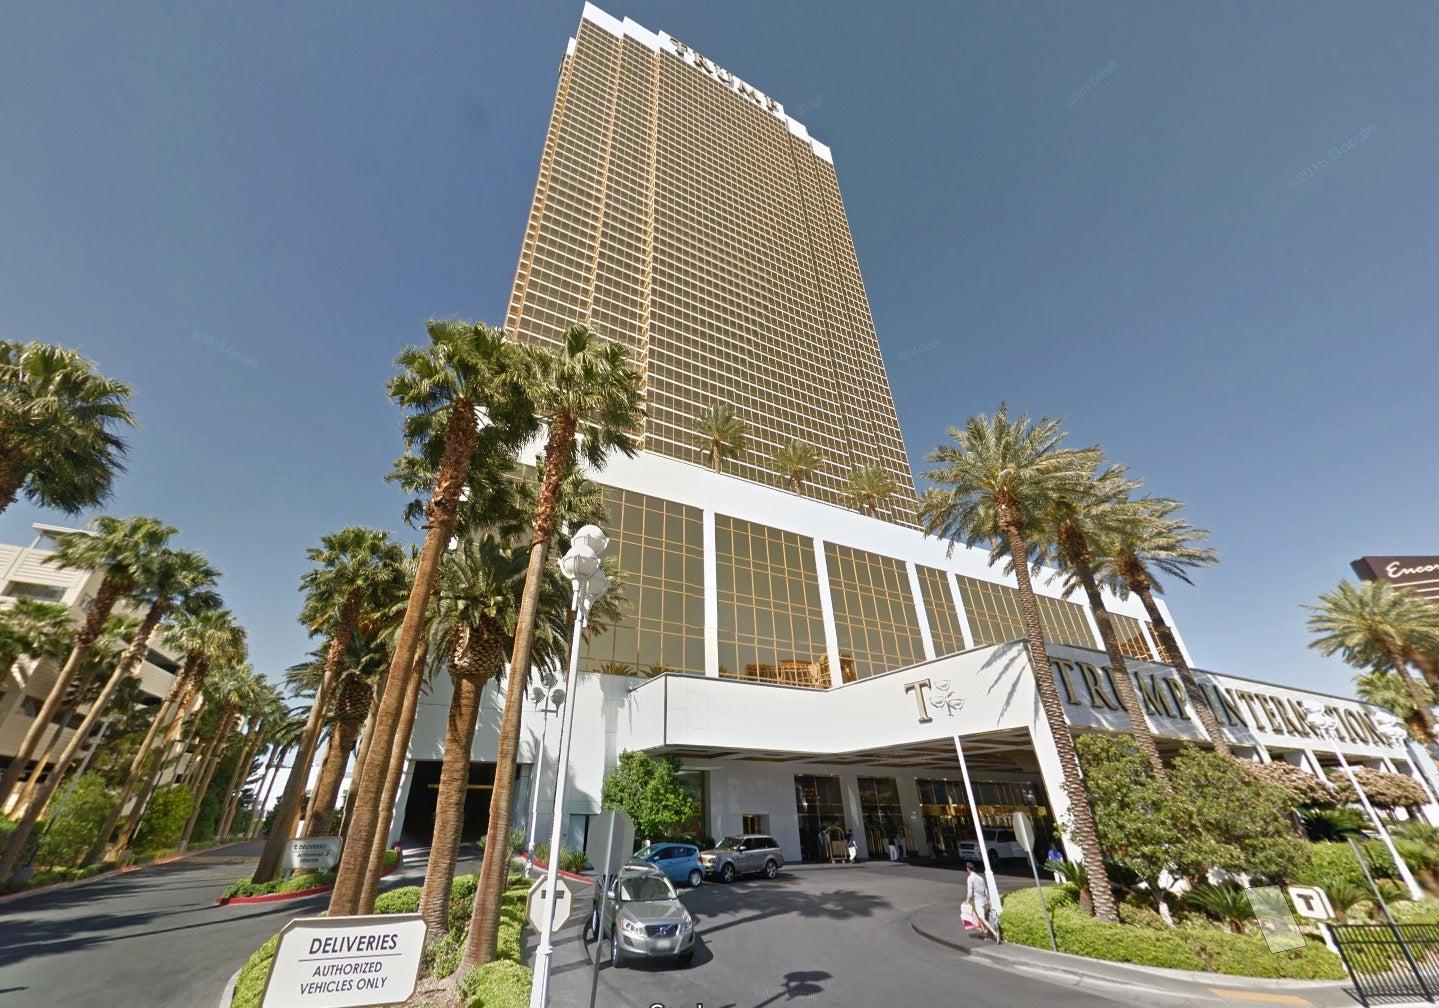 Overseas Casino for - 820037